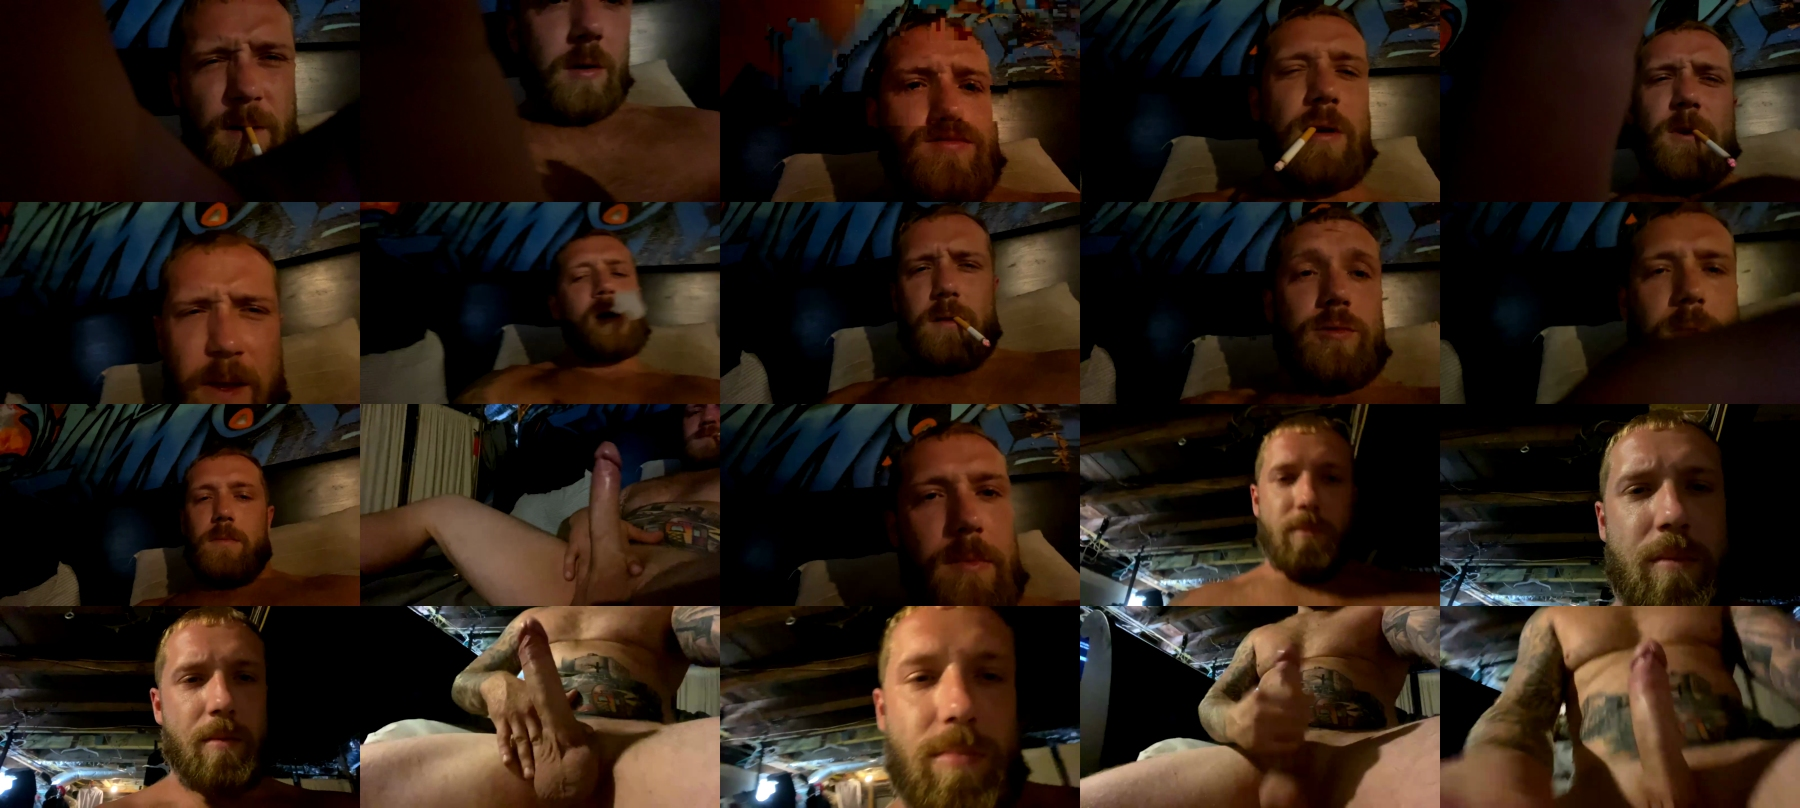 Im8wenstr8 Chaturbate 22-07-2021 video kissing